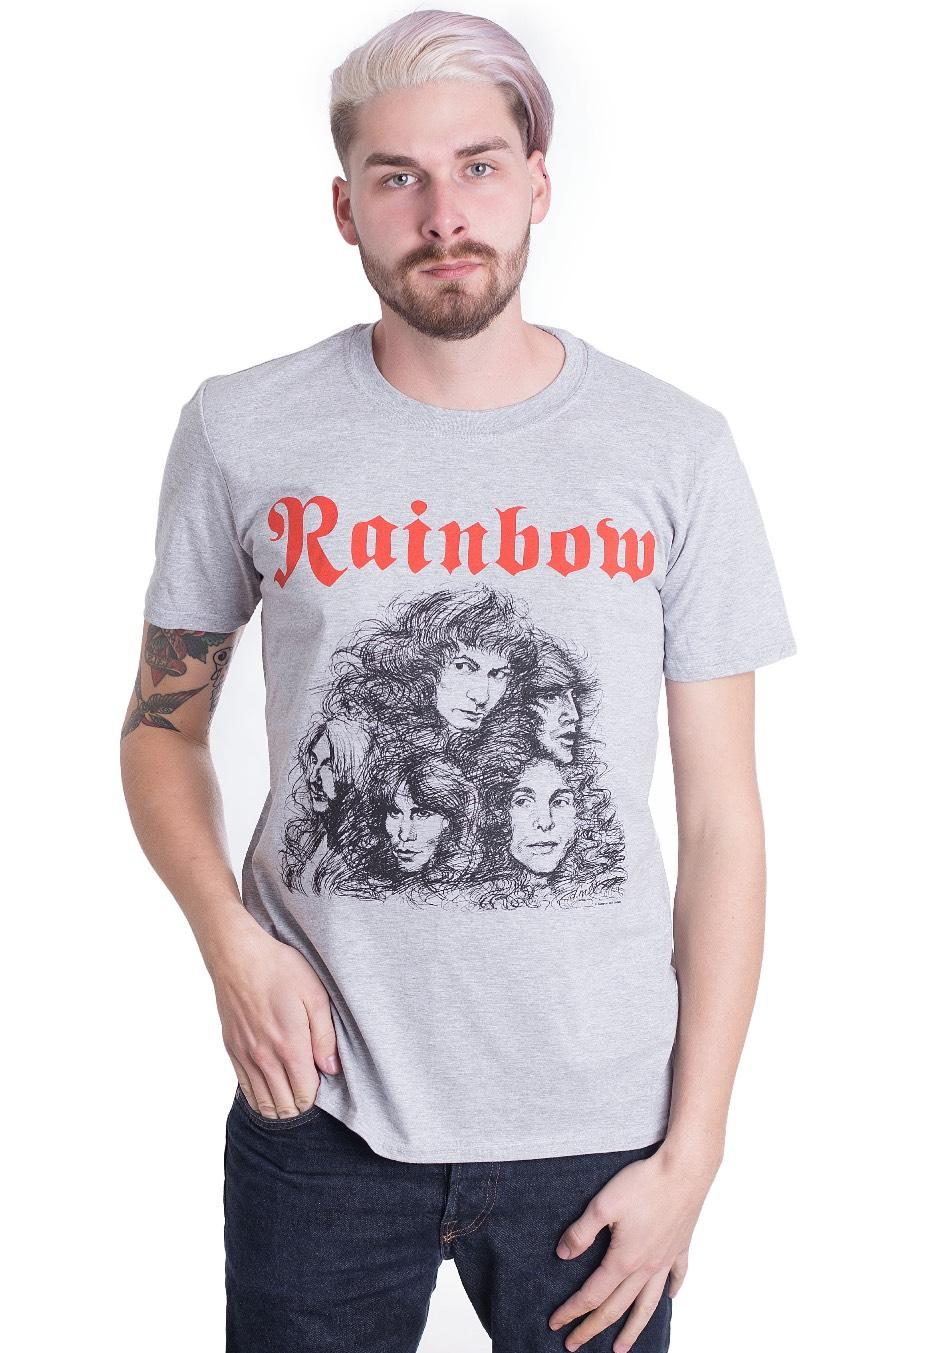 611b00318 Rainbow - Long Live Rock N Roll Grey - T-Shirt - Official Glam Rock  Merchandise Shop - Impericon.com US